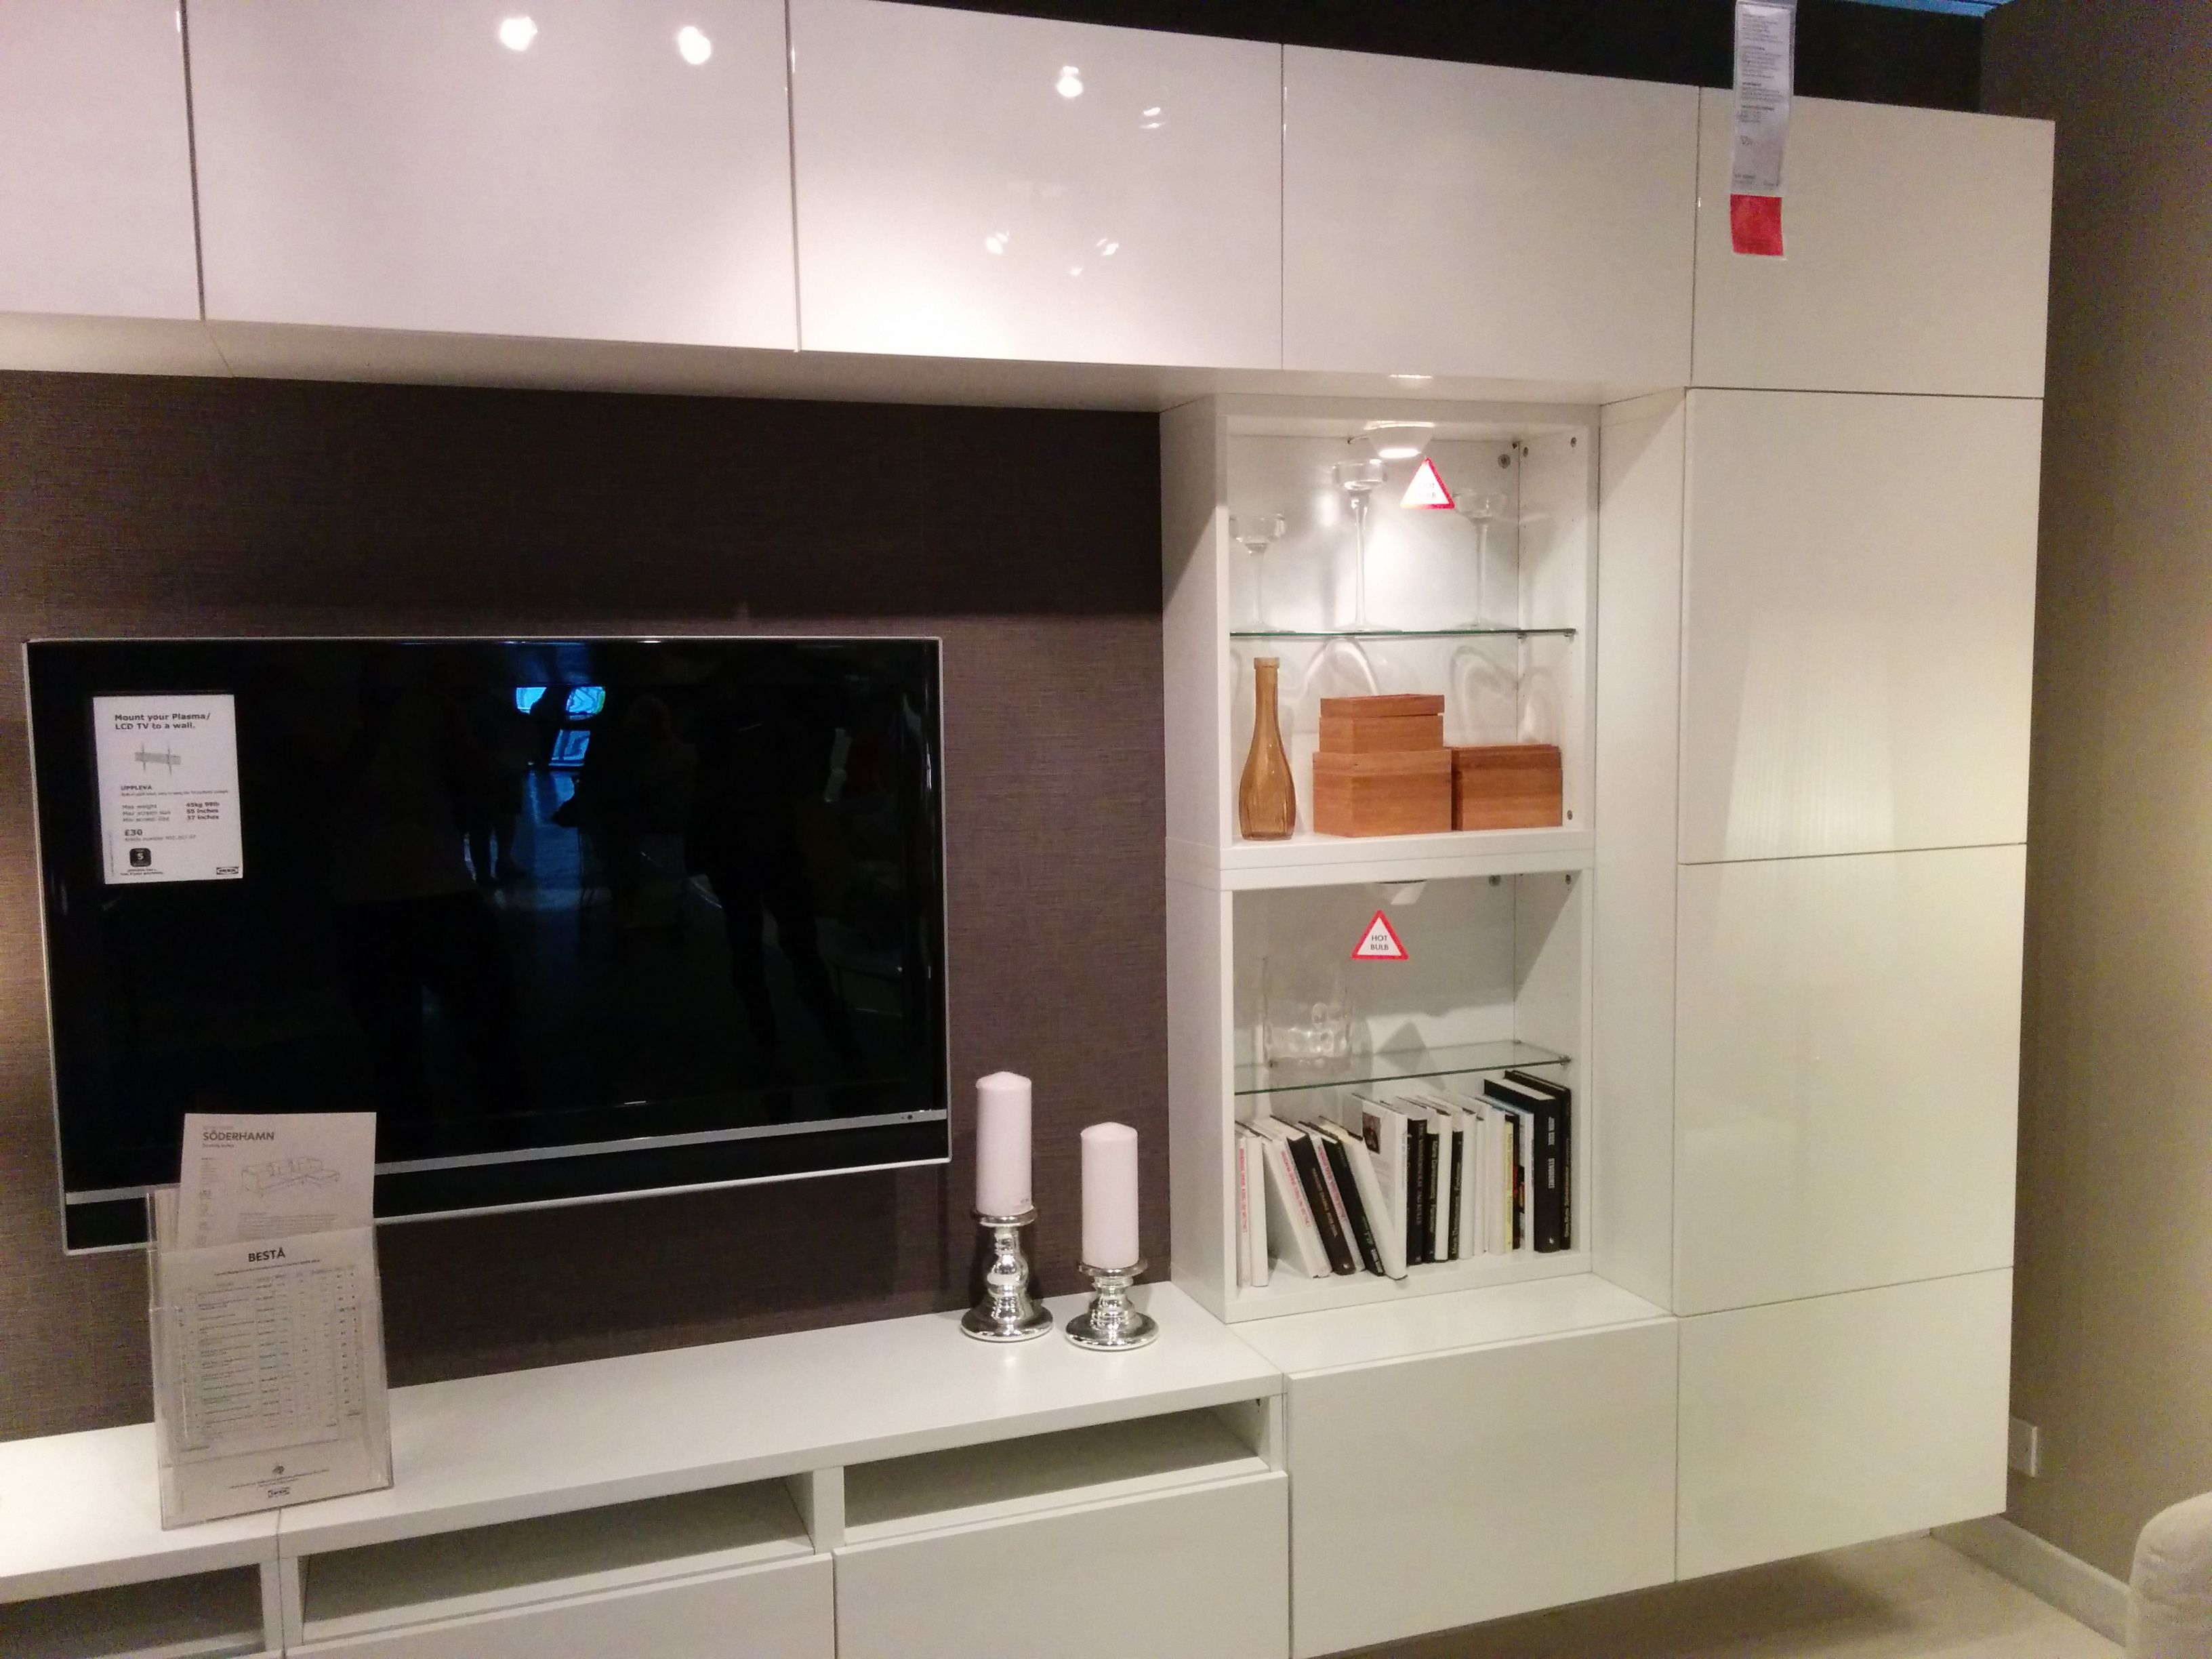 Tv Idea Ikea Living Room Home Interior Design Interior Design Living Room